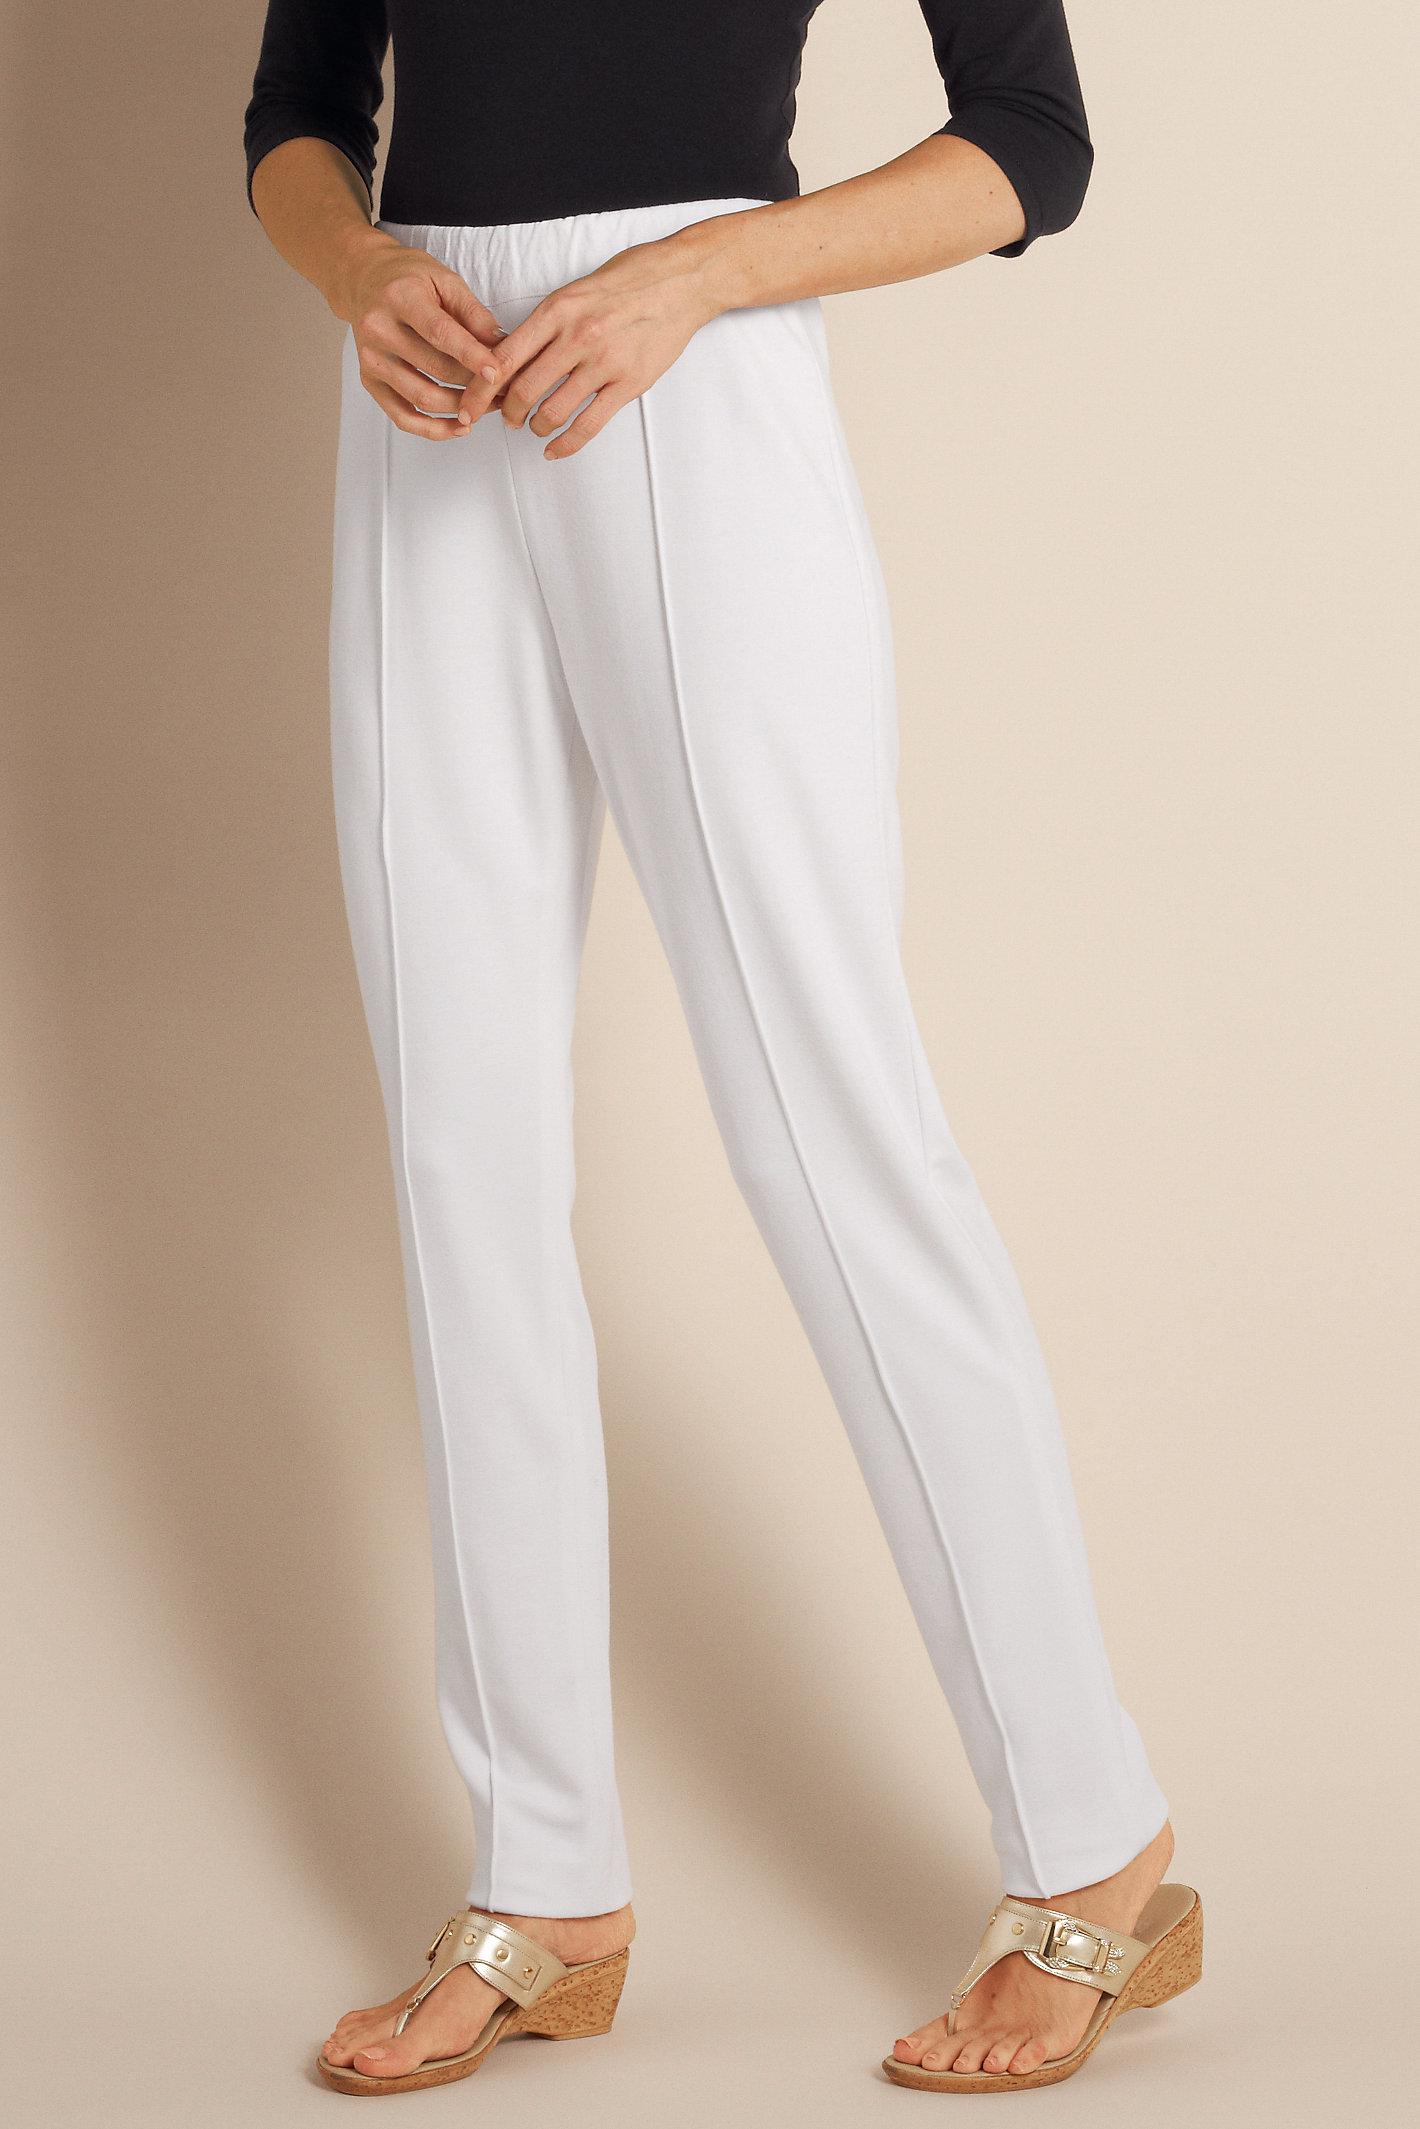 Women Skinny Stretch Pant